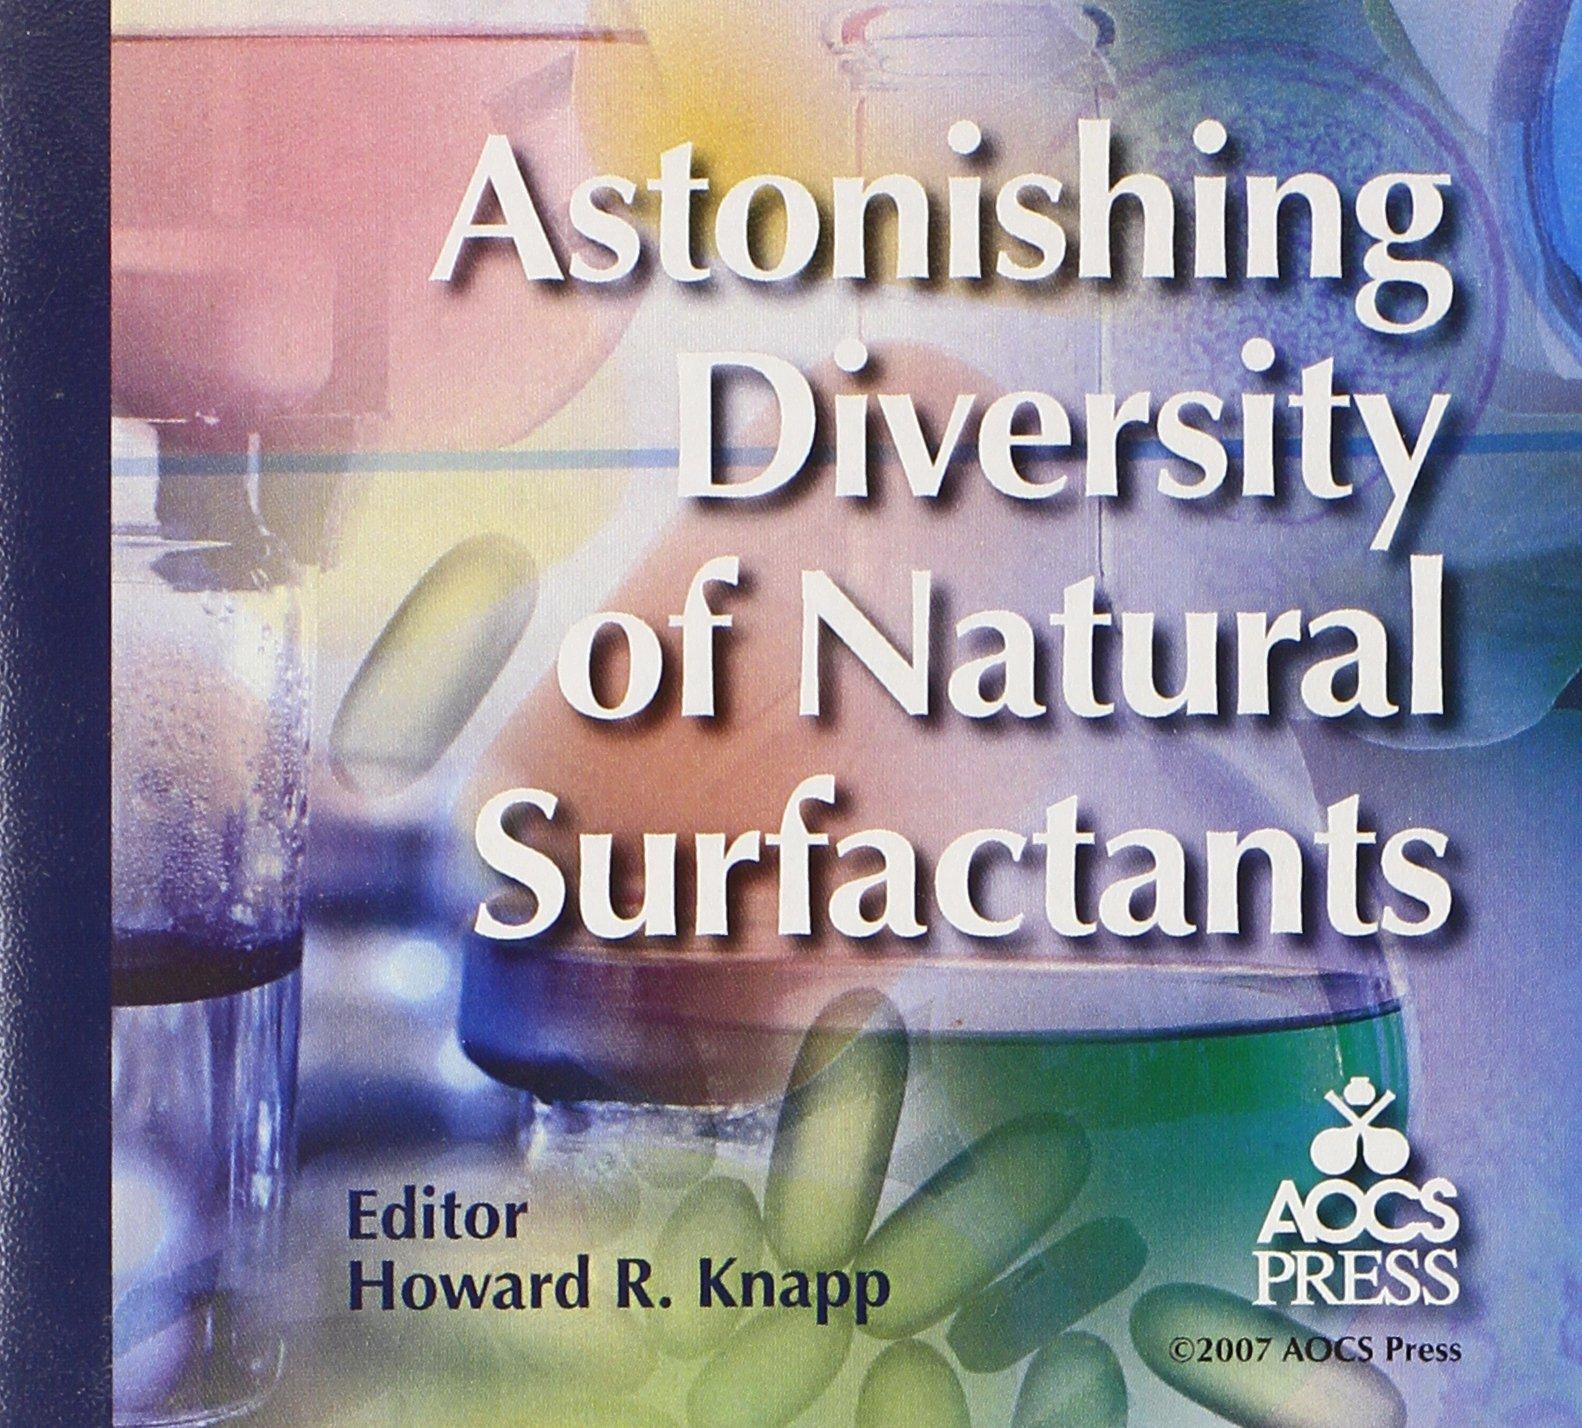 Astonishing Diversity of Natural Surfactants CD-ROM by AOCS Publishing